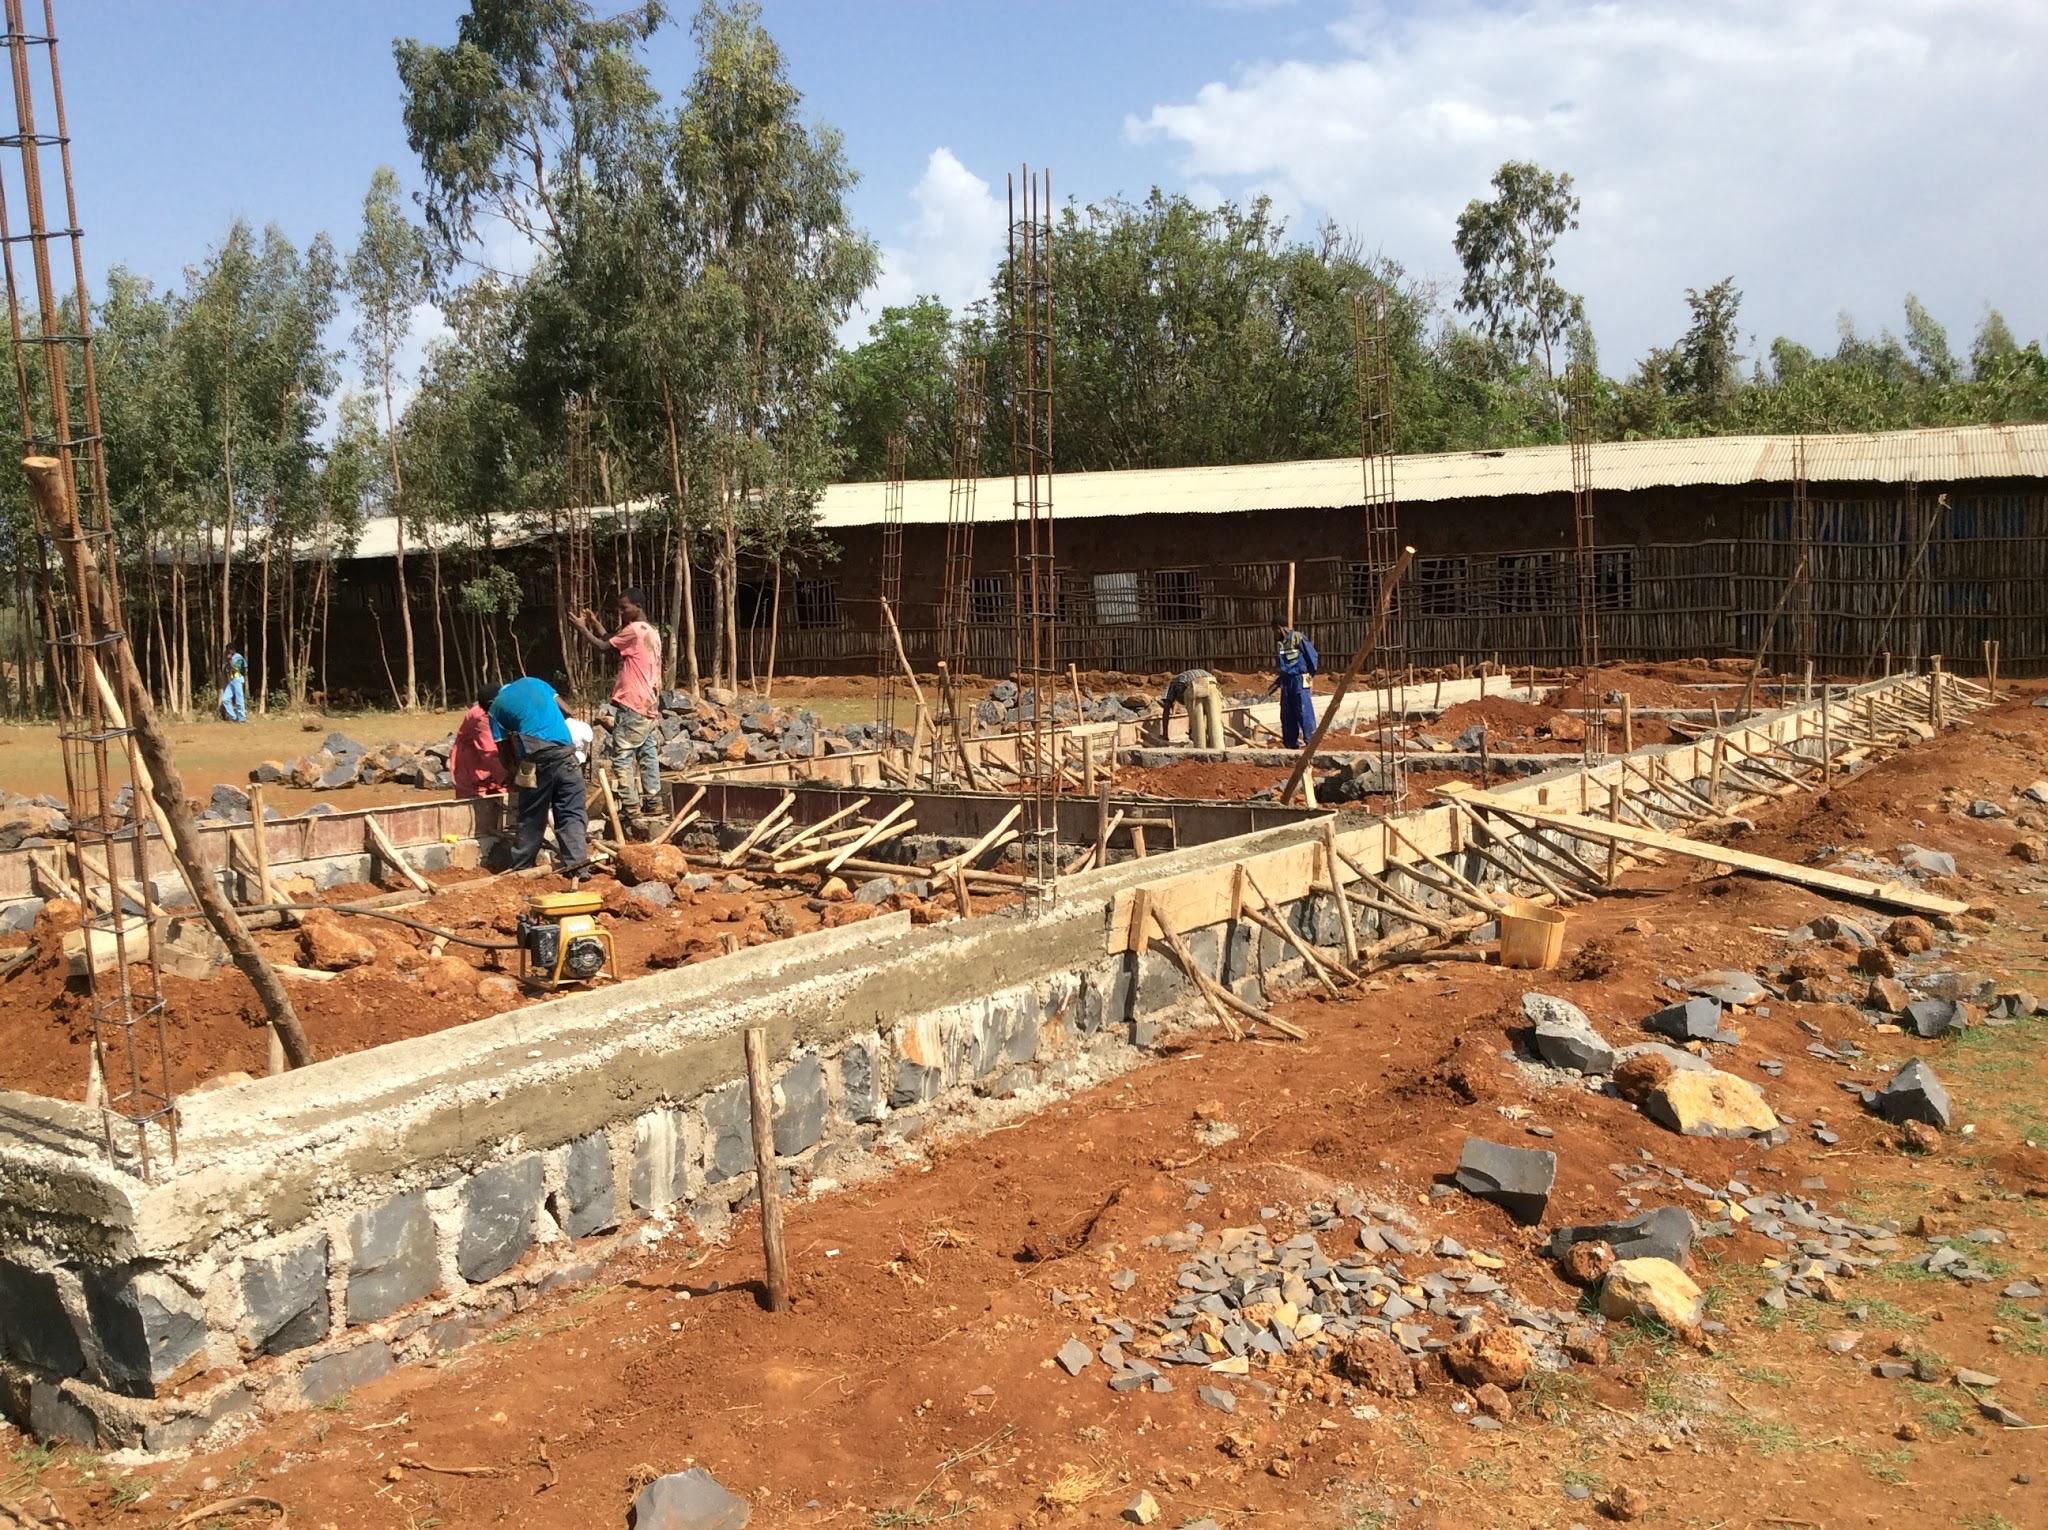 Copy of Abay Mado Elementary School